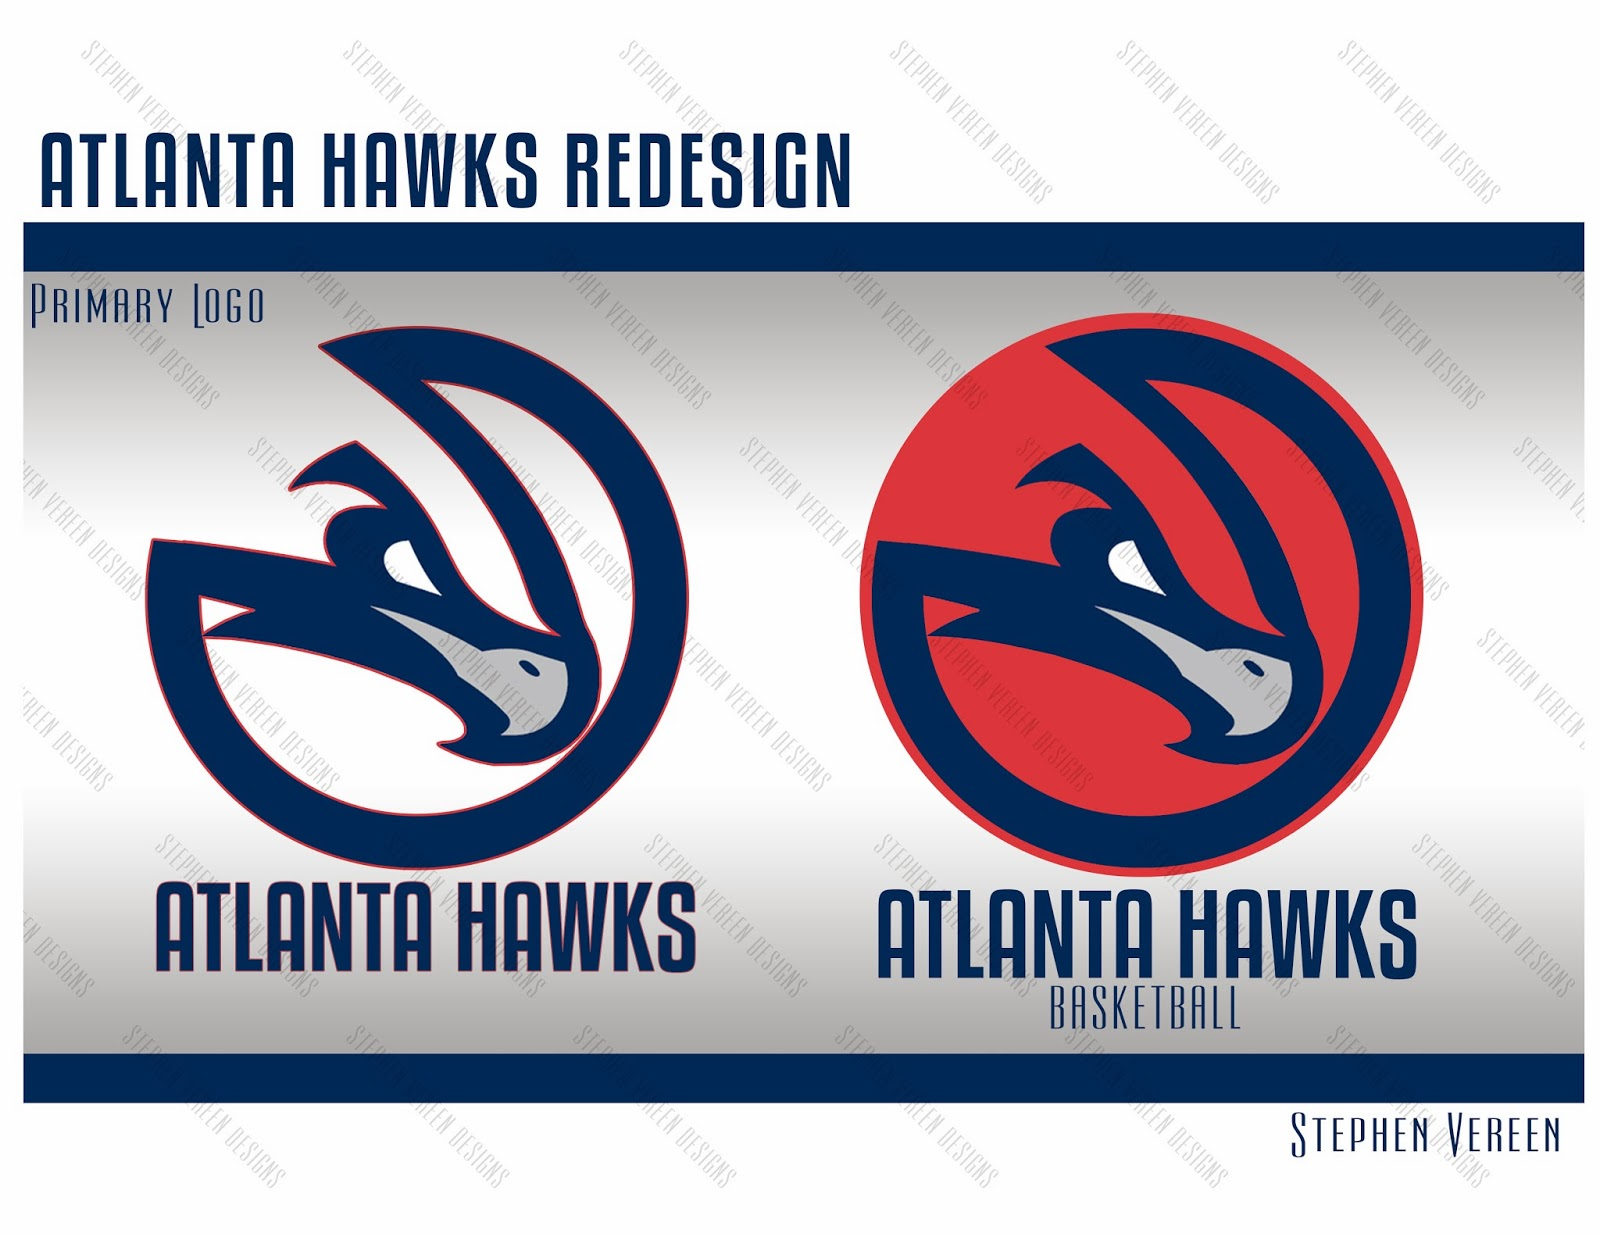 Atlanta hawks new primary logo stephen vereen new primary logo buycottarizona